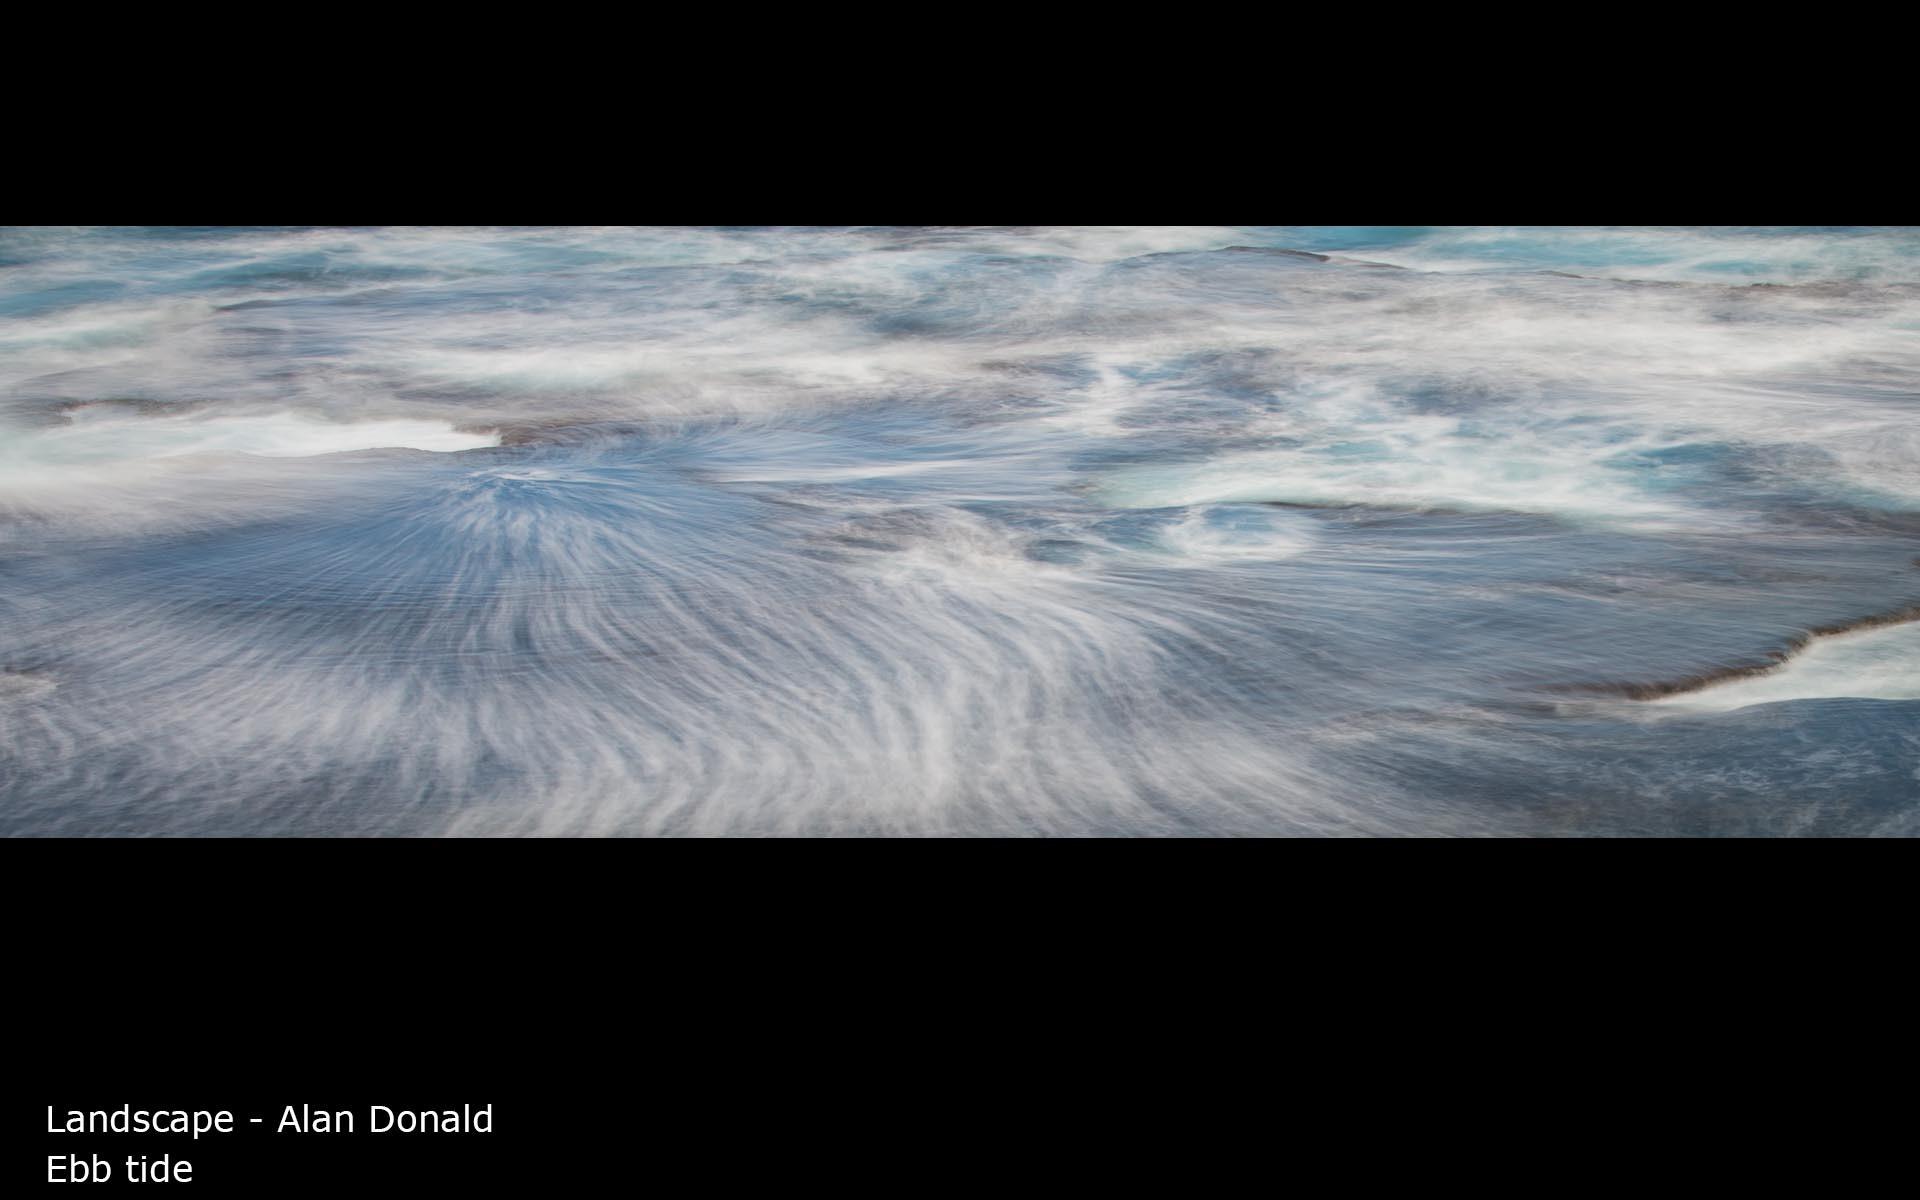 Ebb tide - Alan Donald